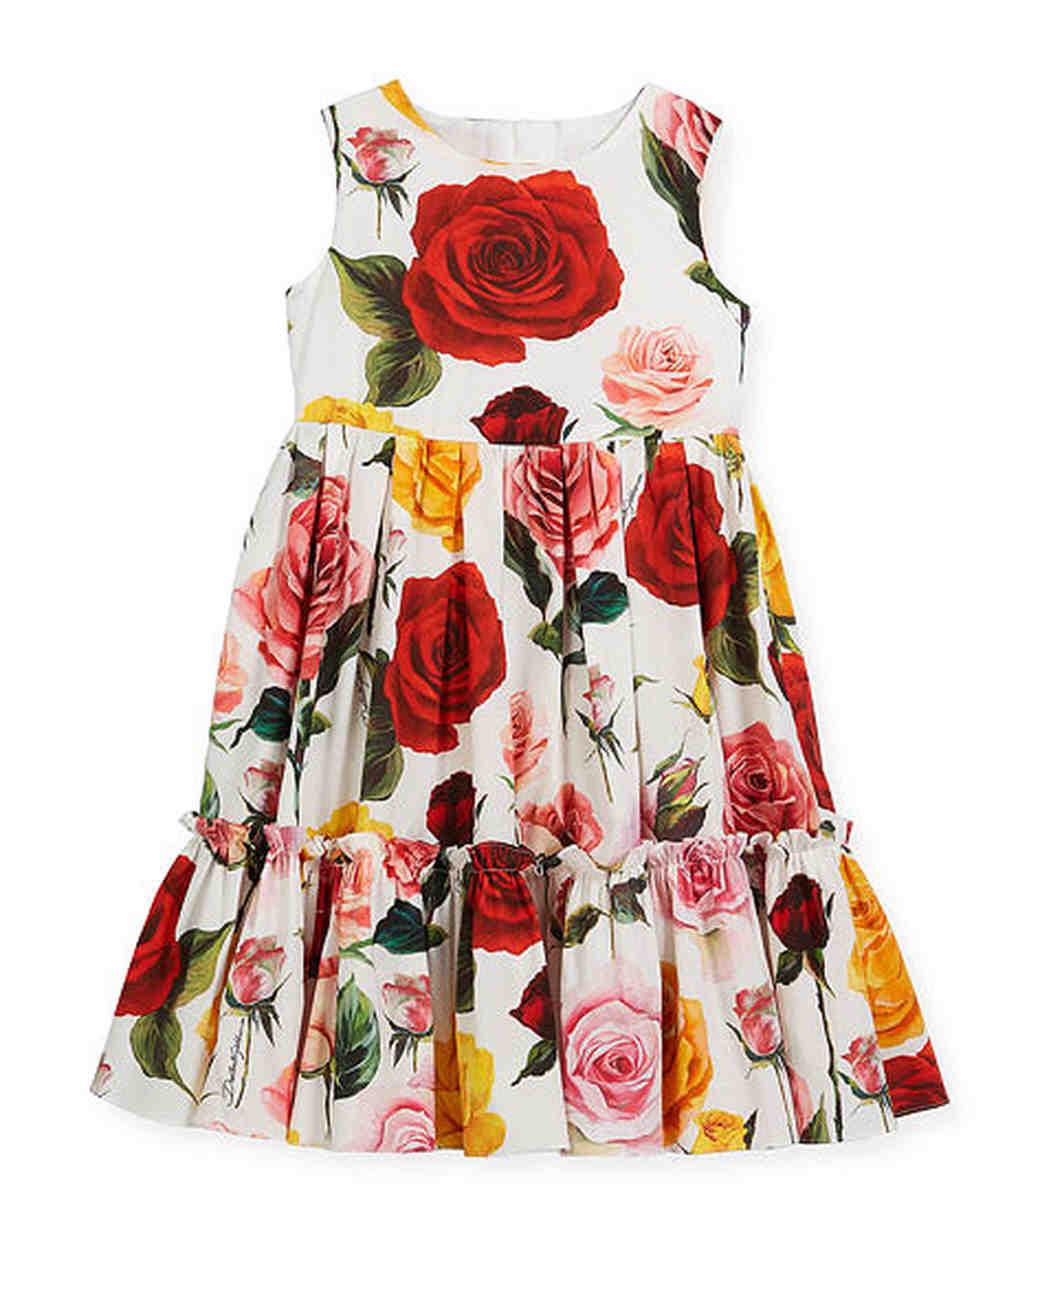 summer flower girl dress pink red yellow roses pattern